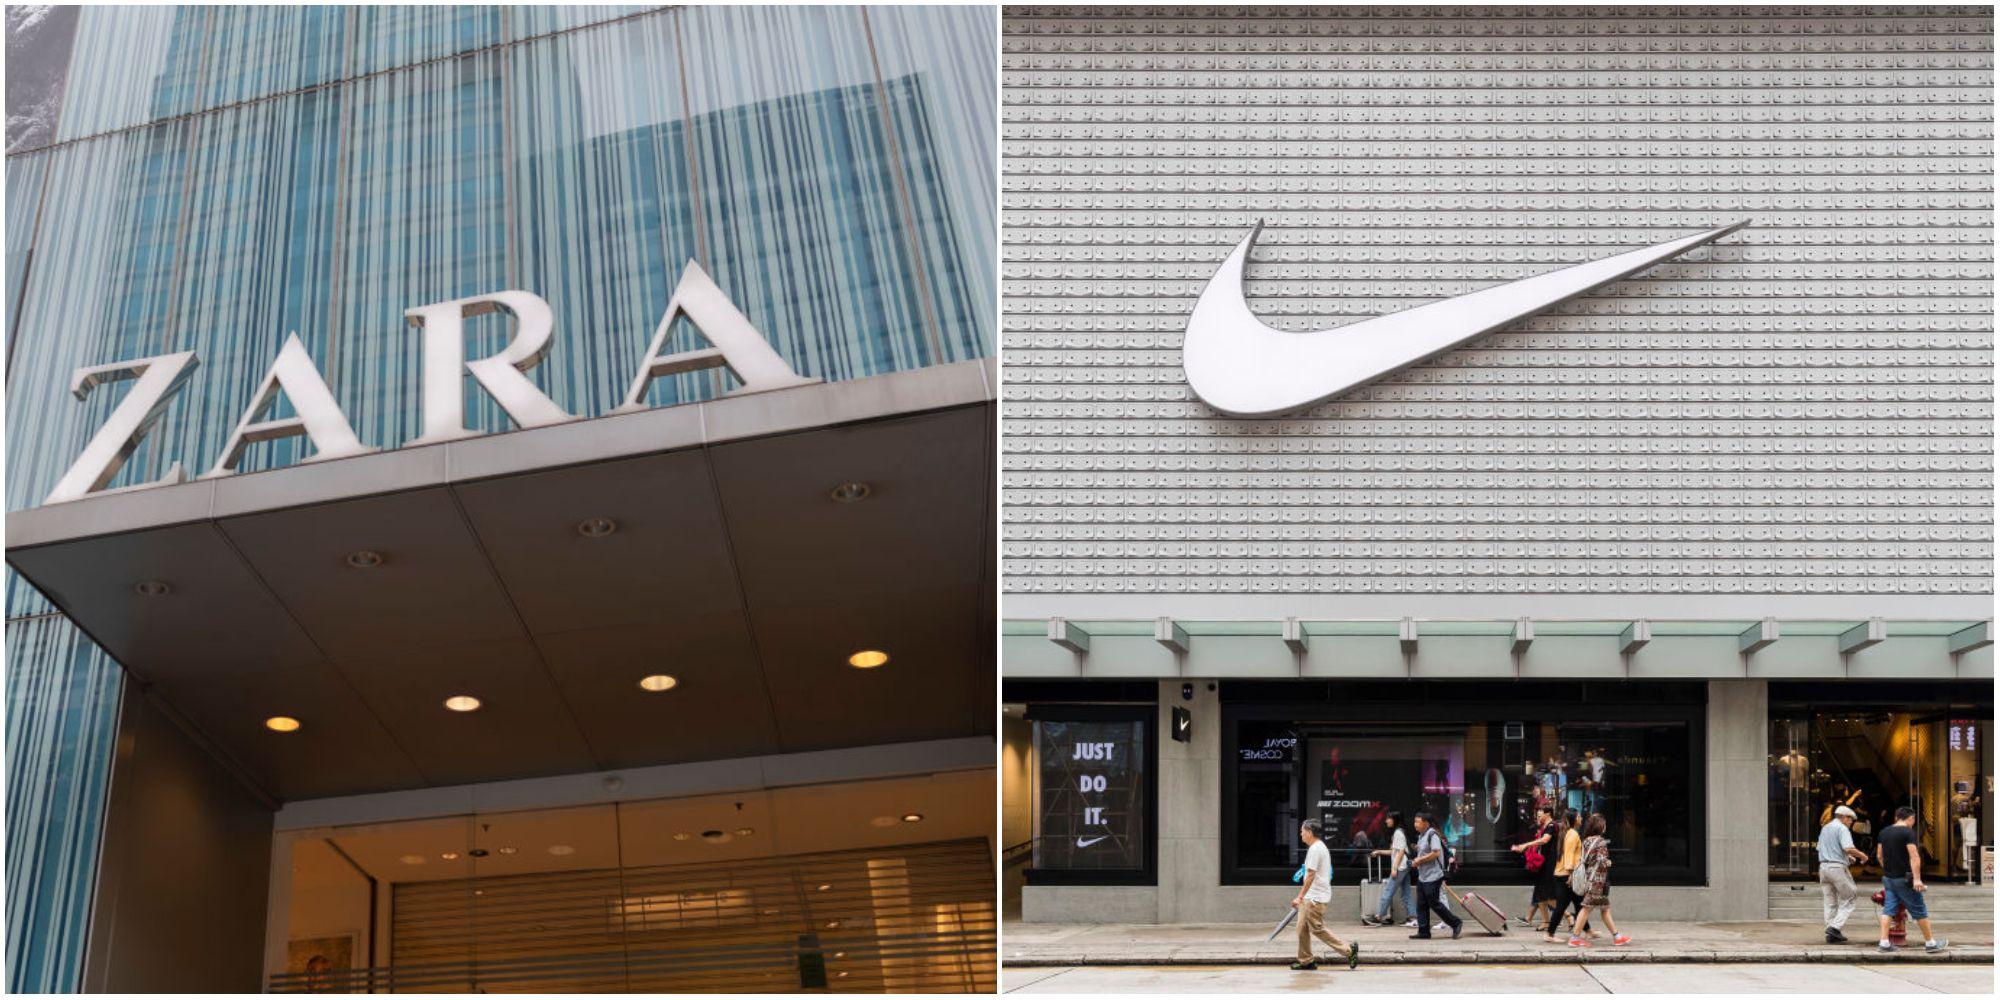 Original punto Turista  Ni Zara ni Nike buscan embajadores en Instagram